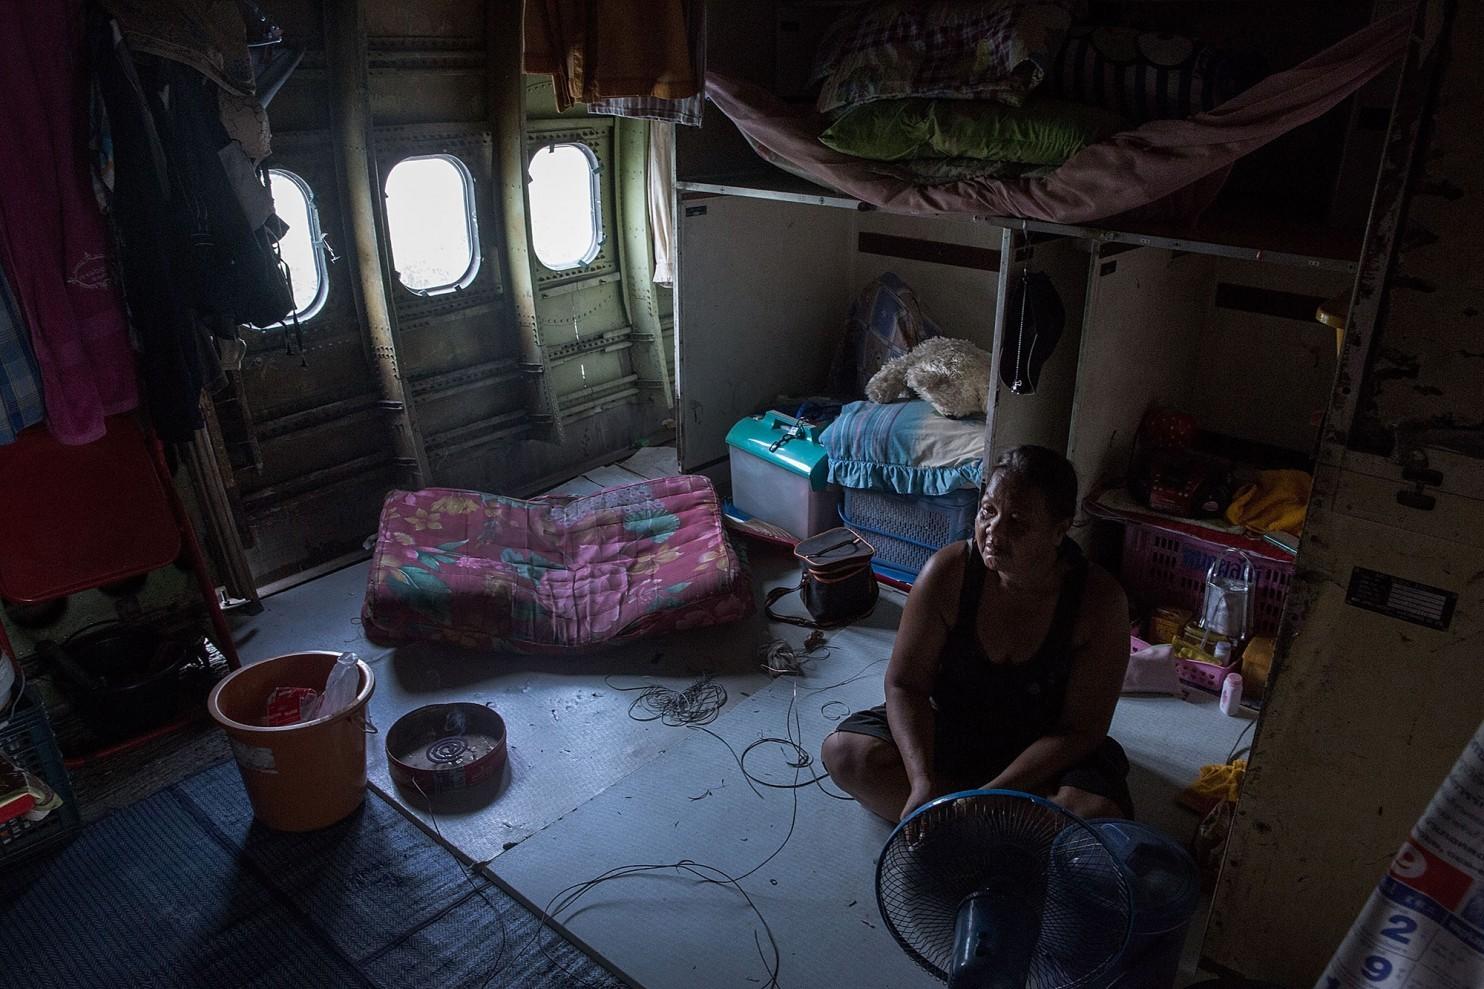 bangkok-airplanes-home-12